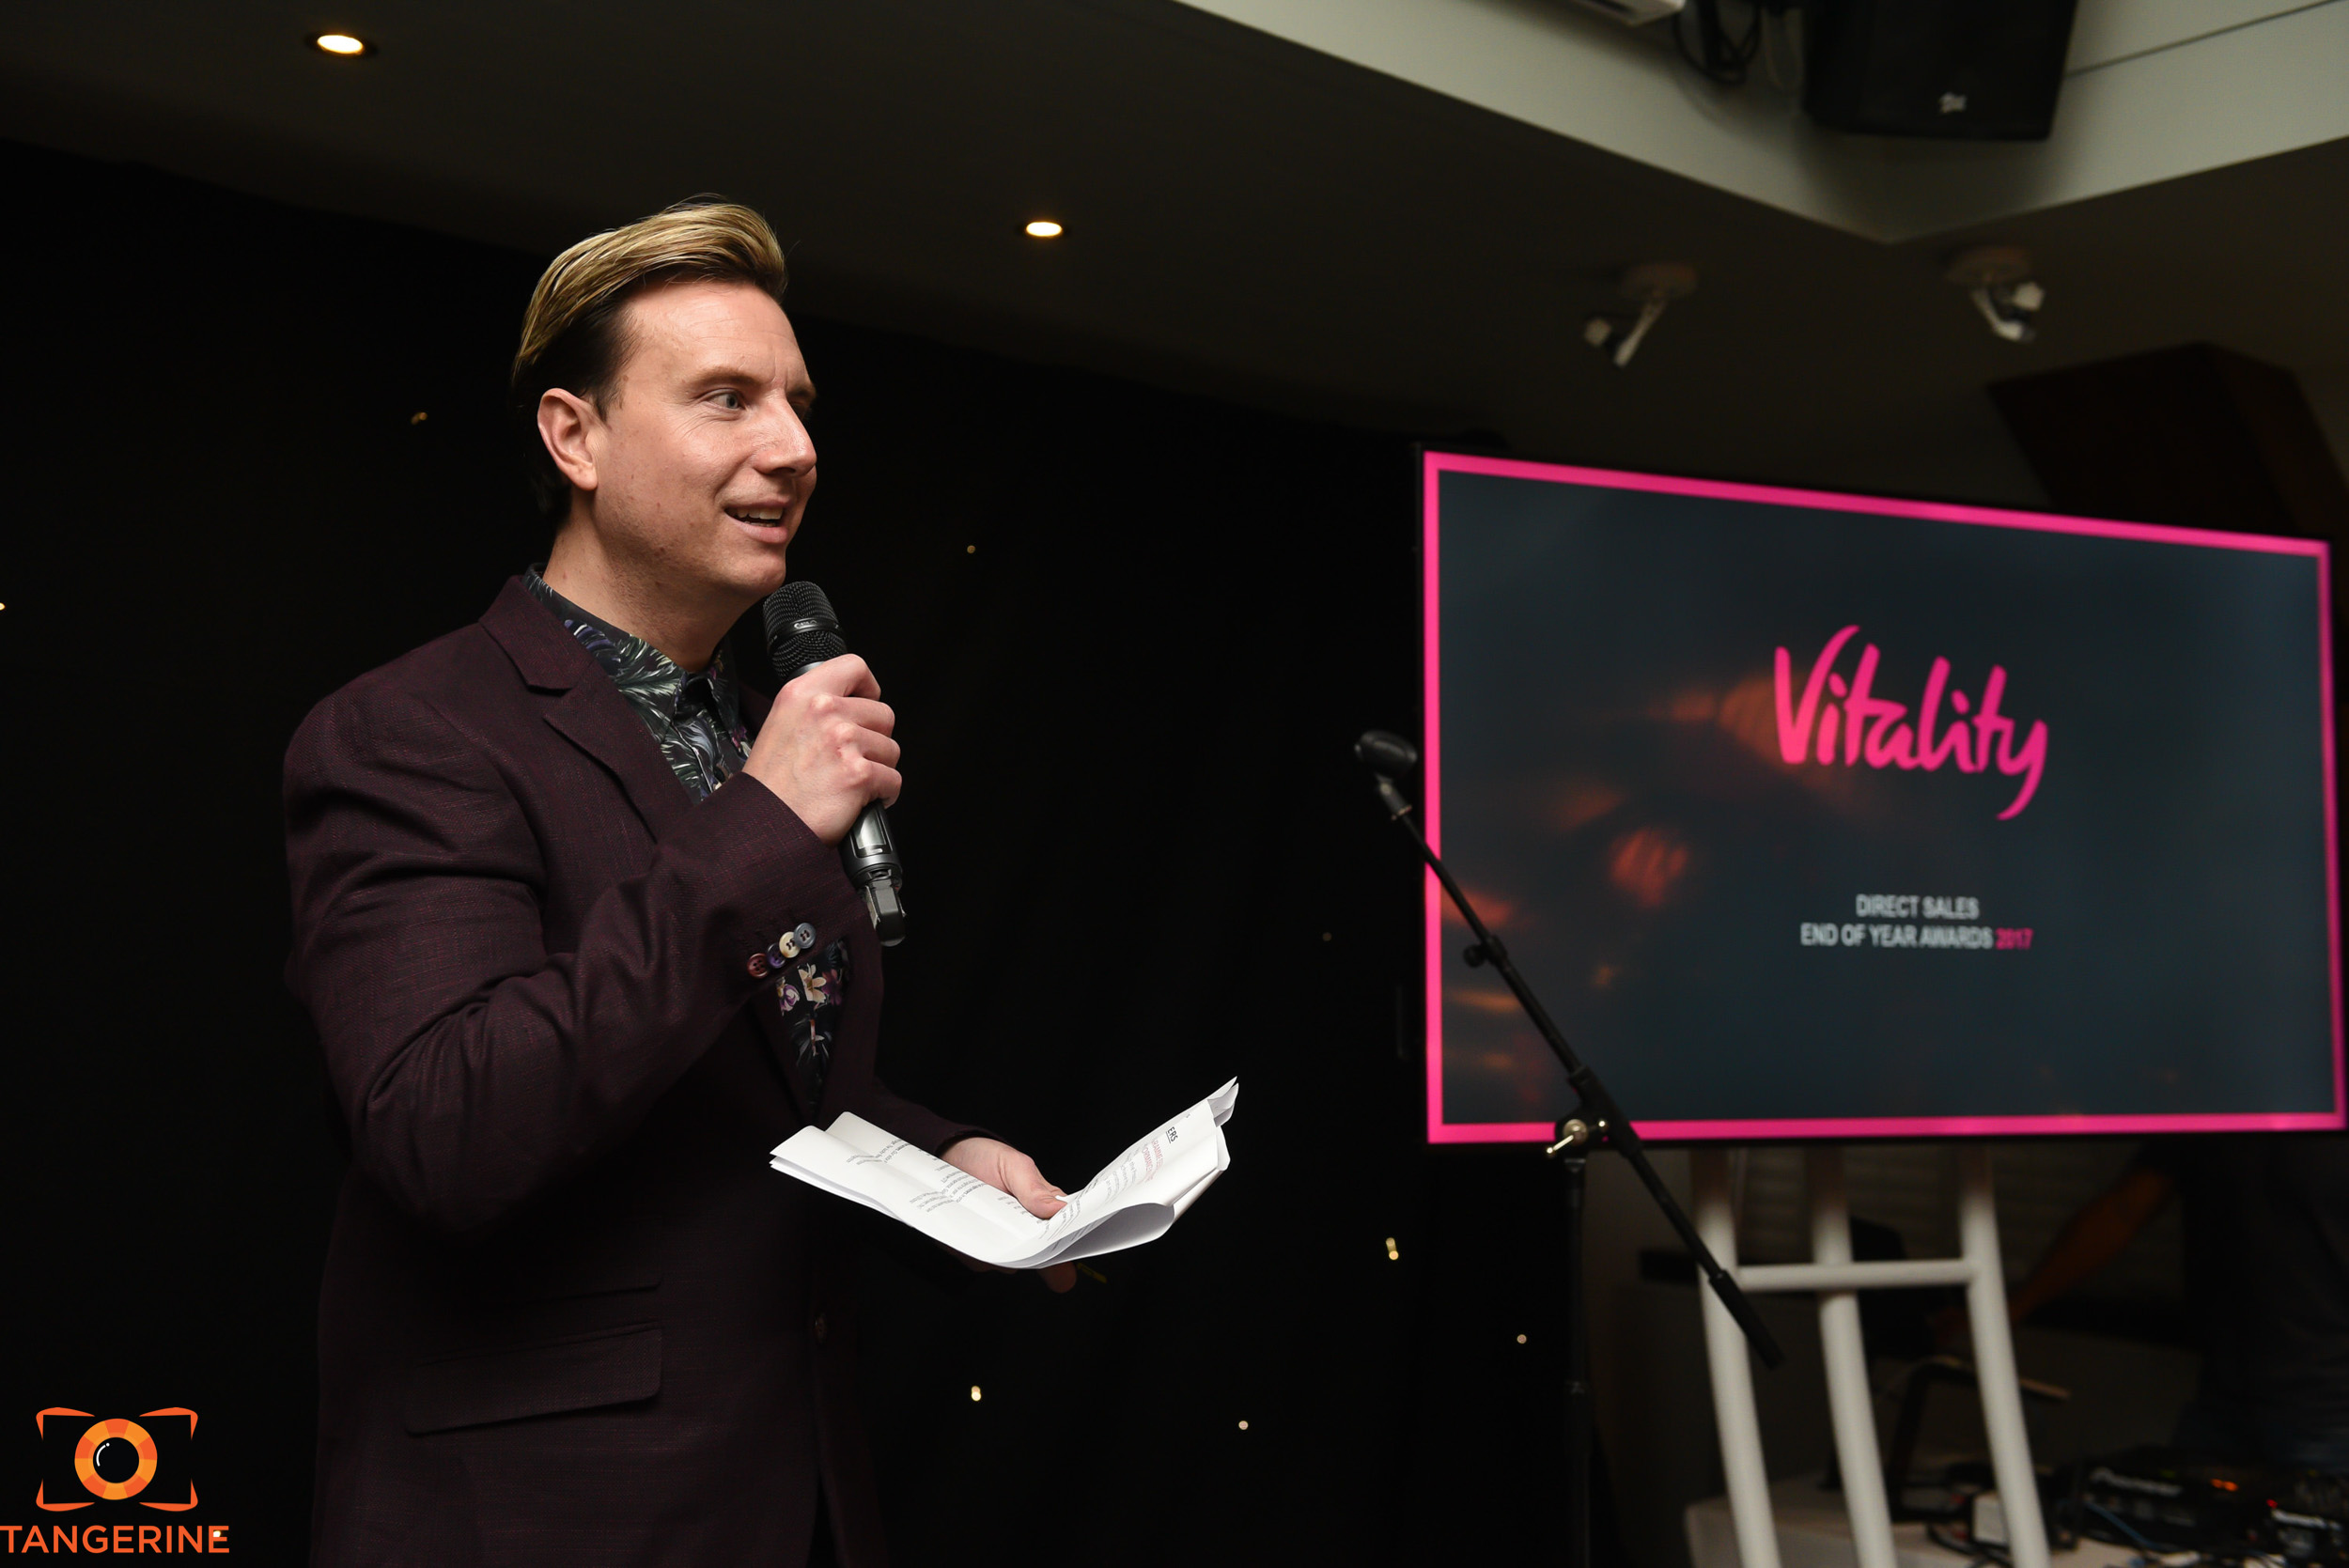 Vitality_Awards-77.jpg